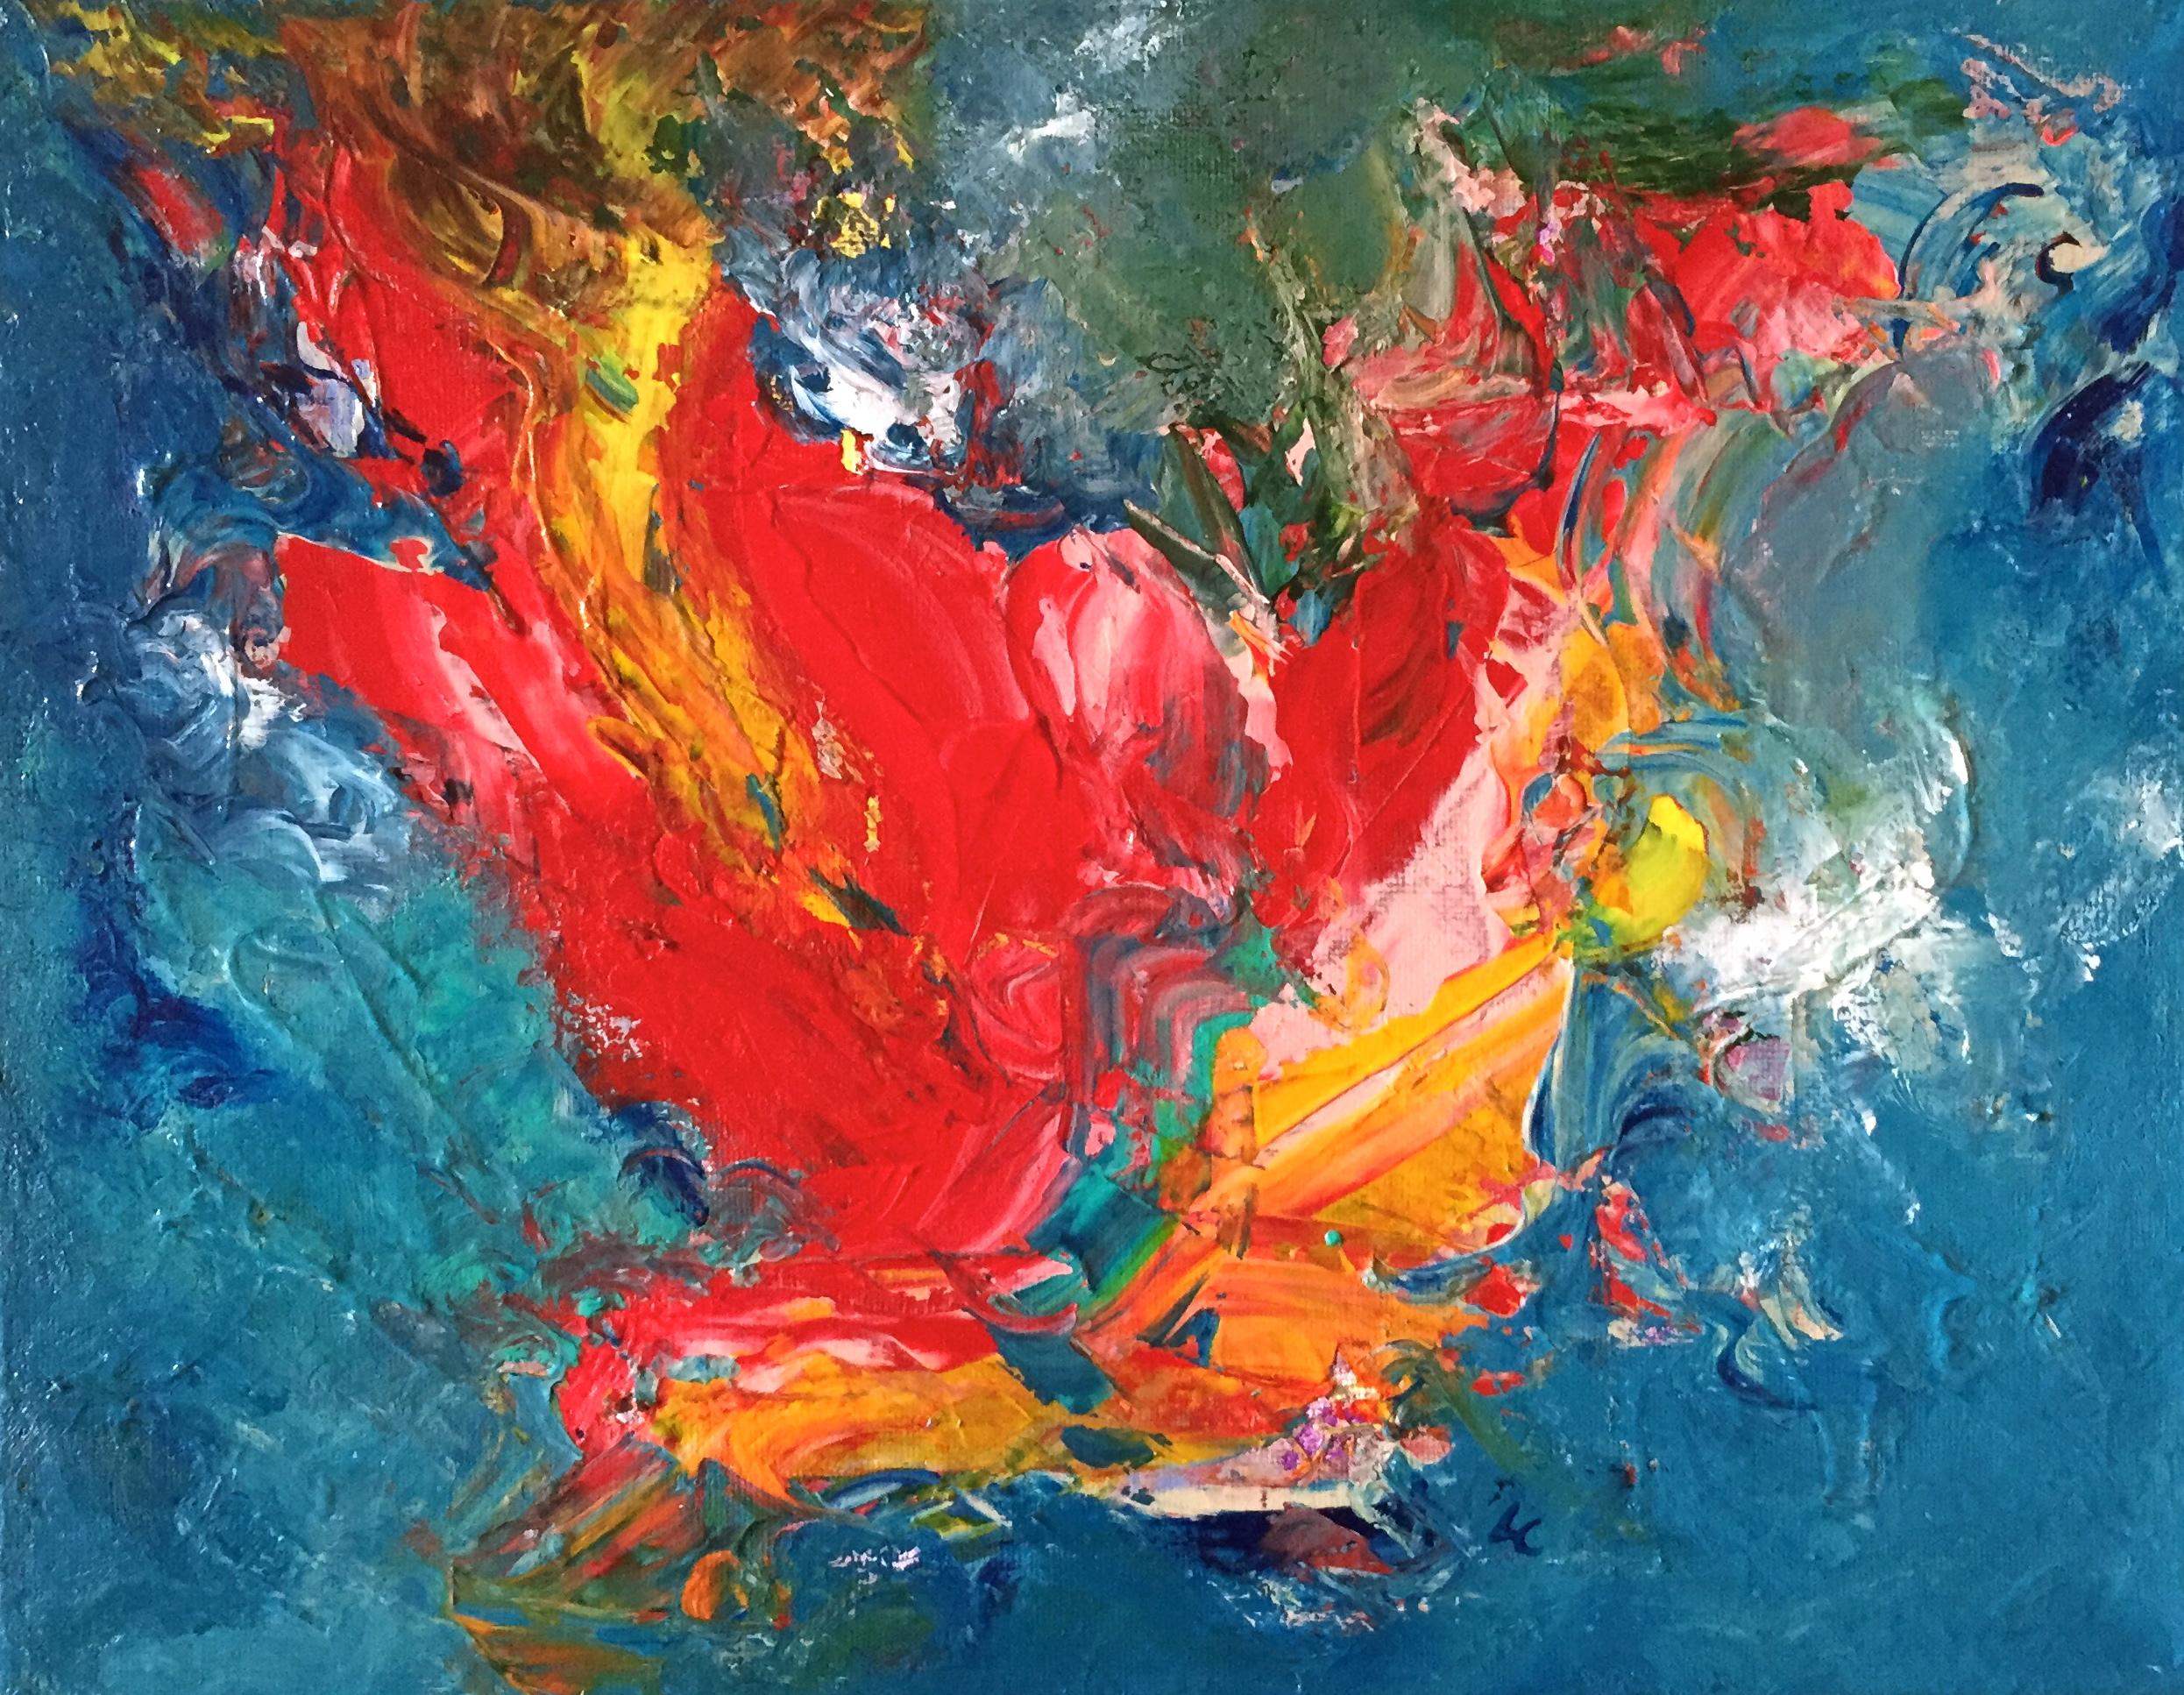 "Angelic Realm 11"" x 14"" acrylic on canvas"